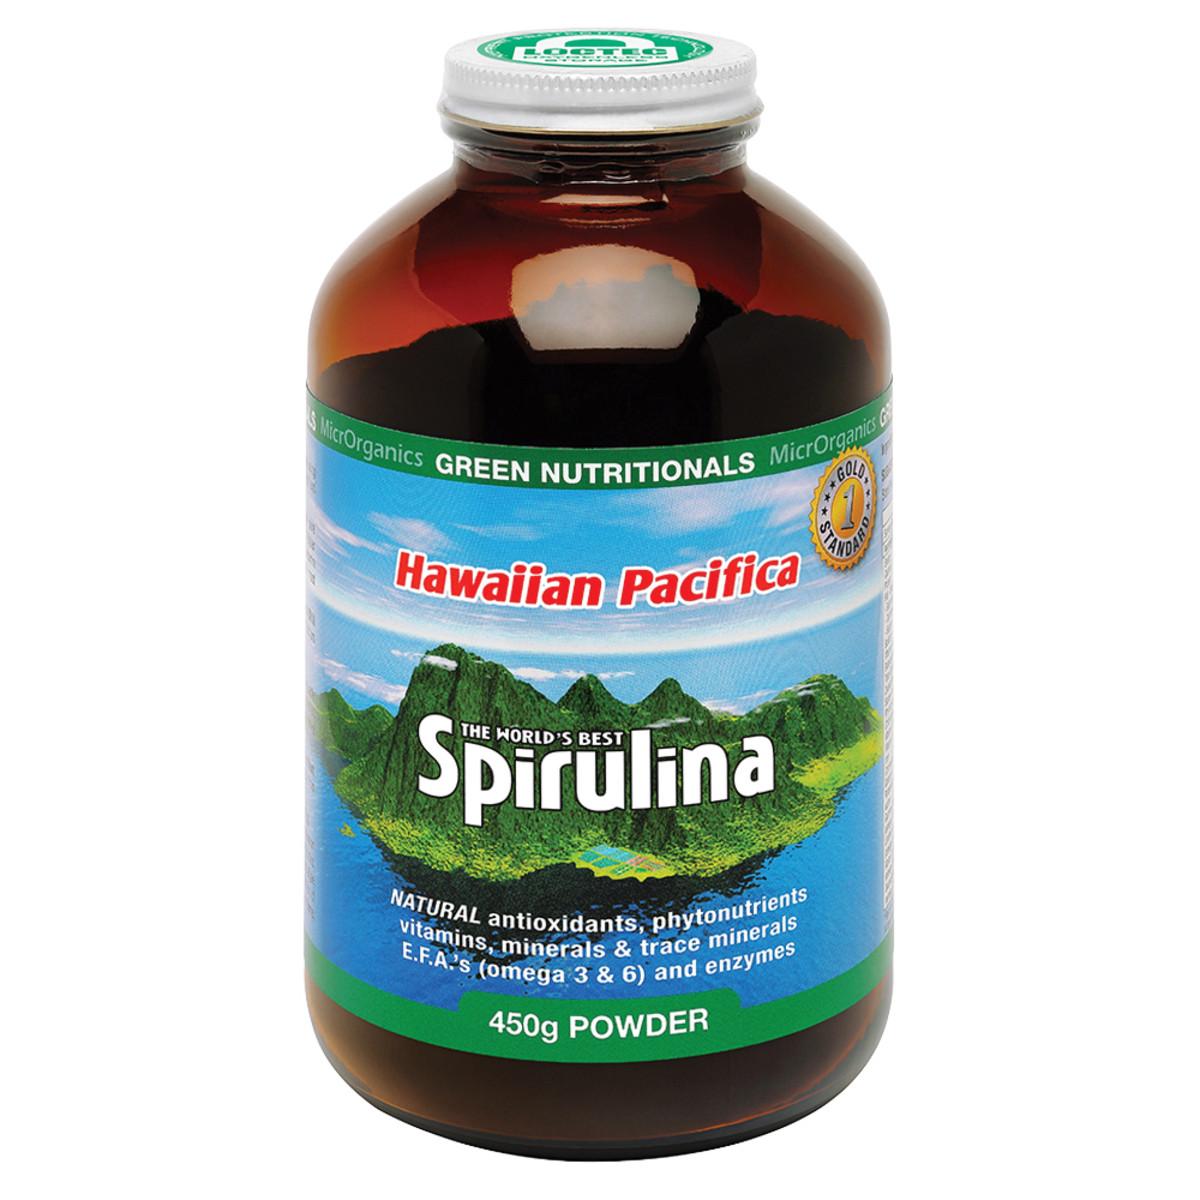 MICRORGANICS GREEN NUTRITIONALS HAWAIIAN PACIFICA SPIRULINA 450G